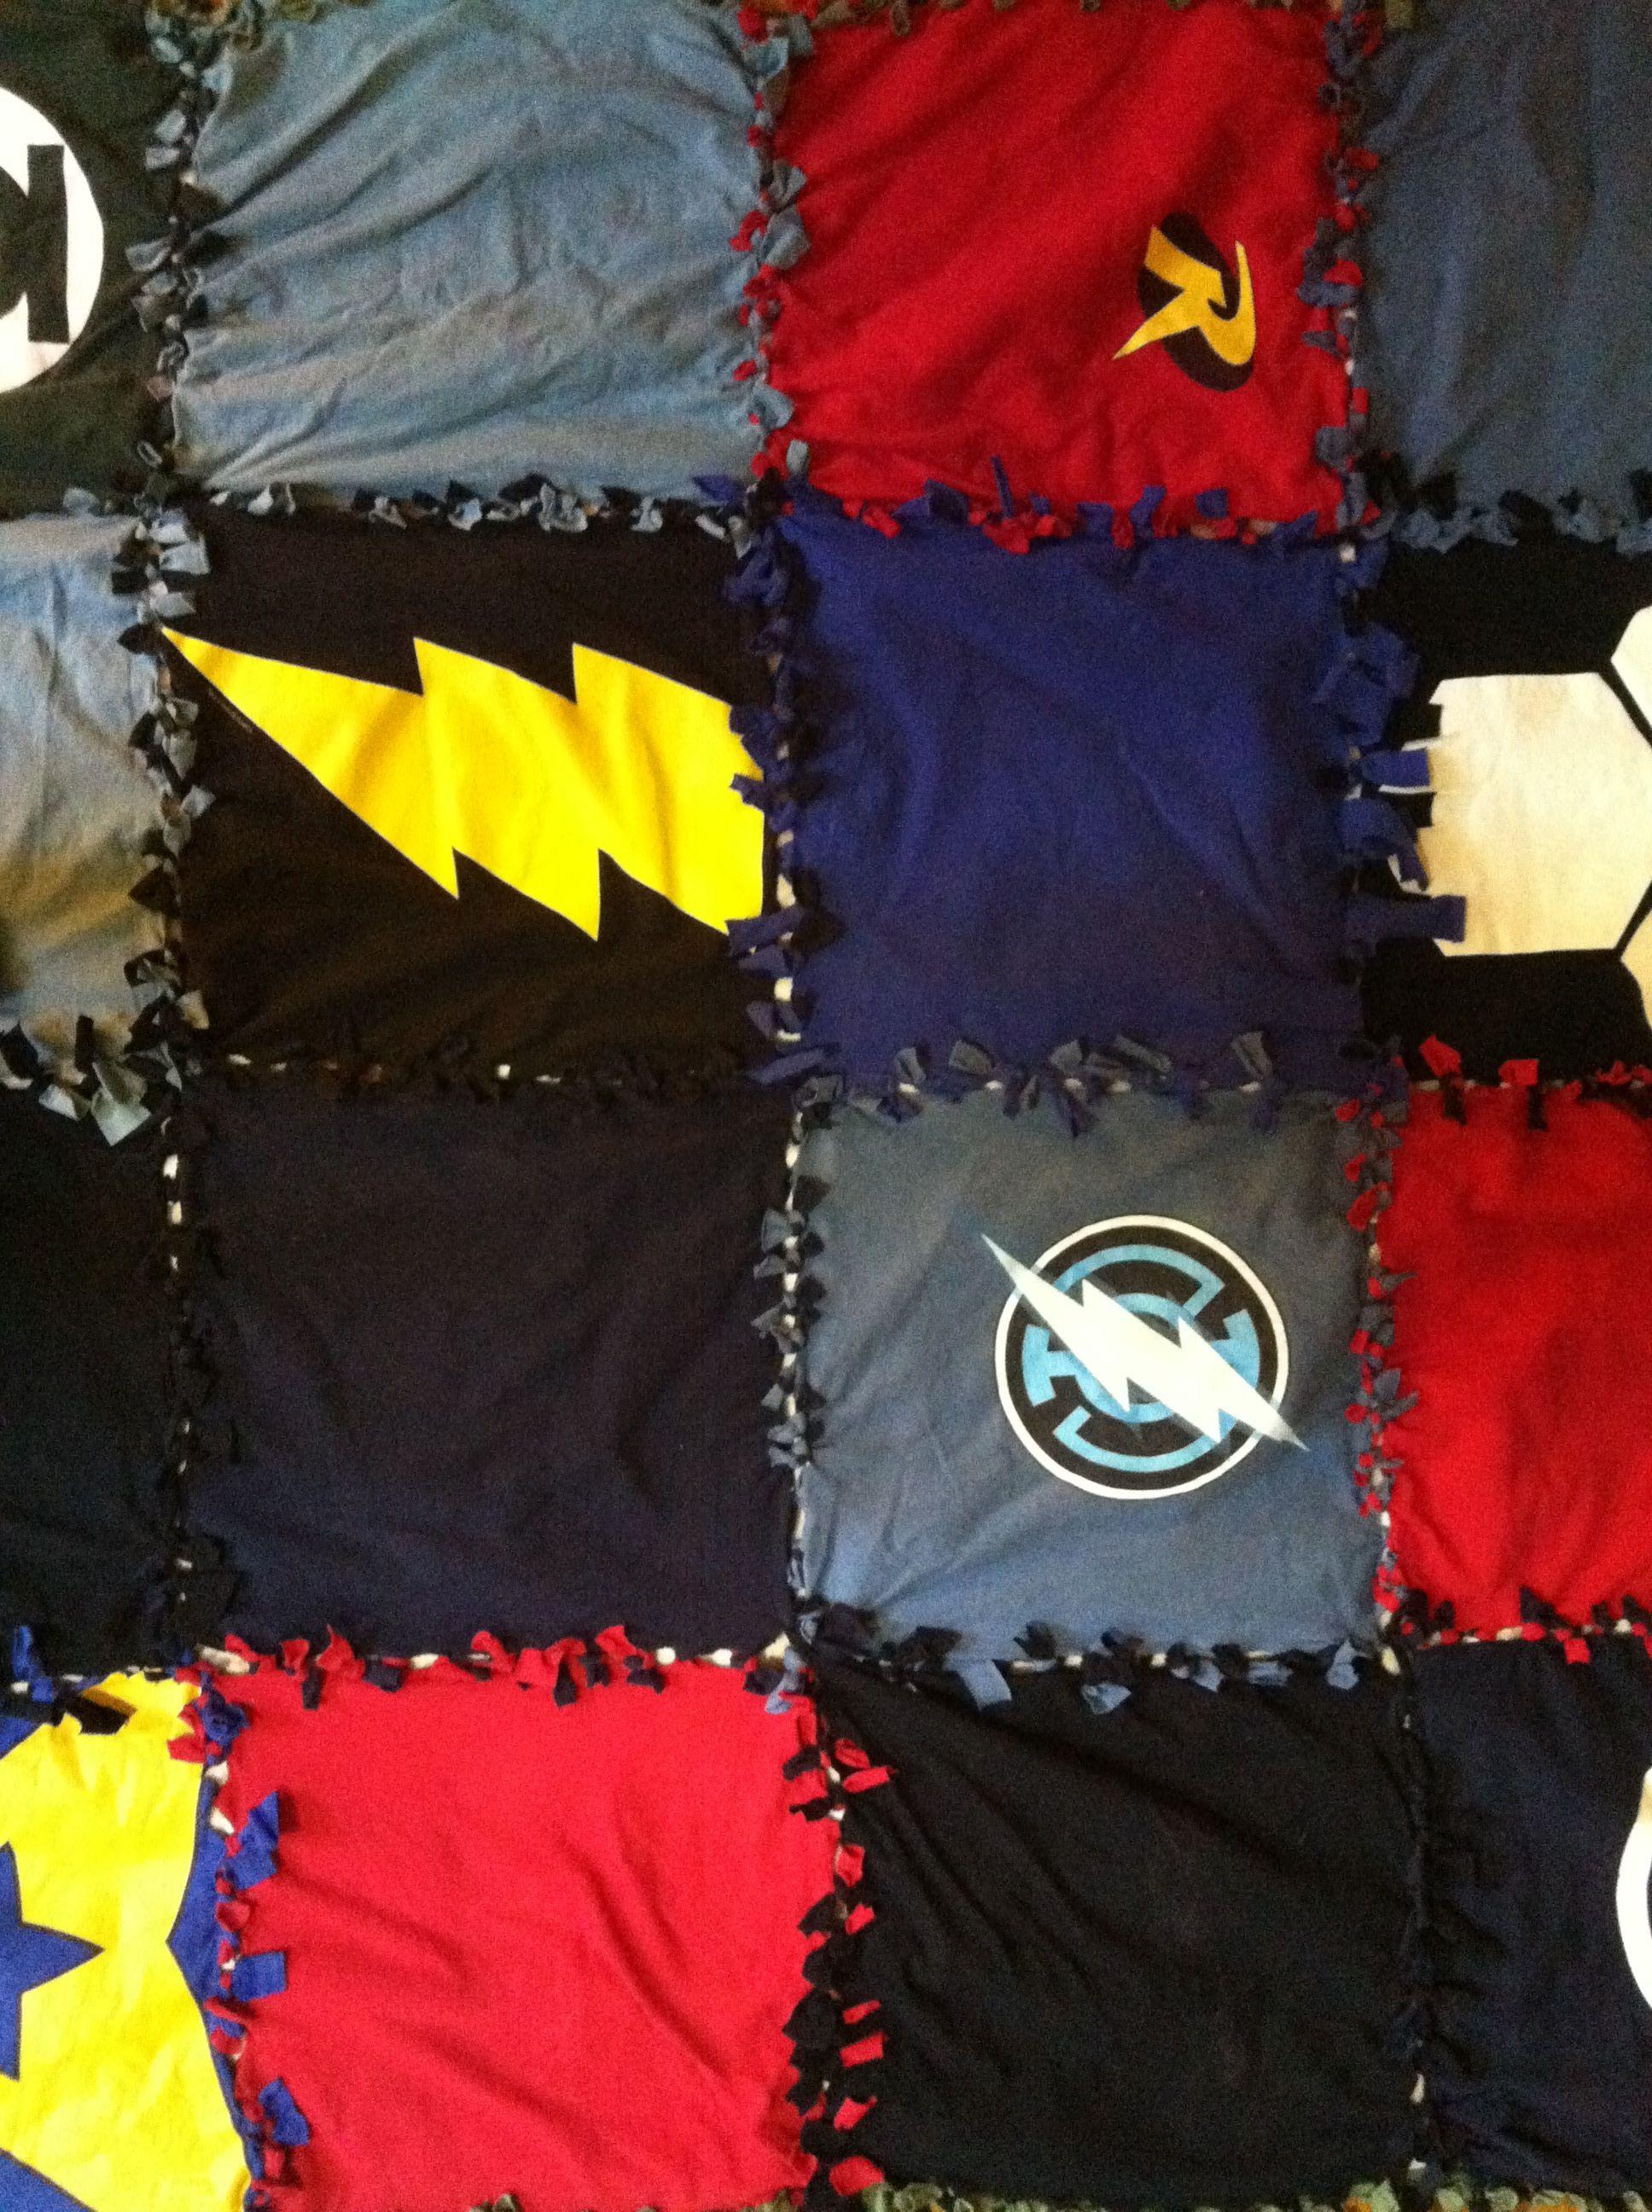 No Sew T-Shirt Blanket | No-sew t-shirt blanket | Simplicity\u0027s & No Sew T-Shirt Blanket | No-sew t-shirt blanket | Simplicity\u0027s ... pillowsntoast.com